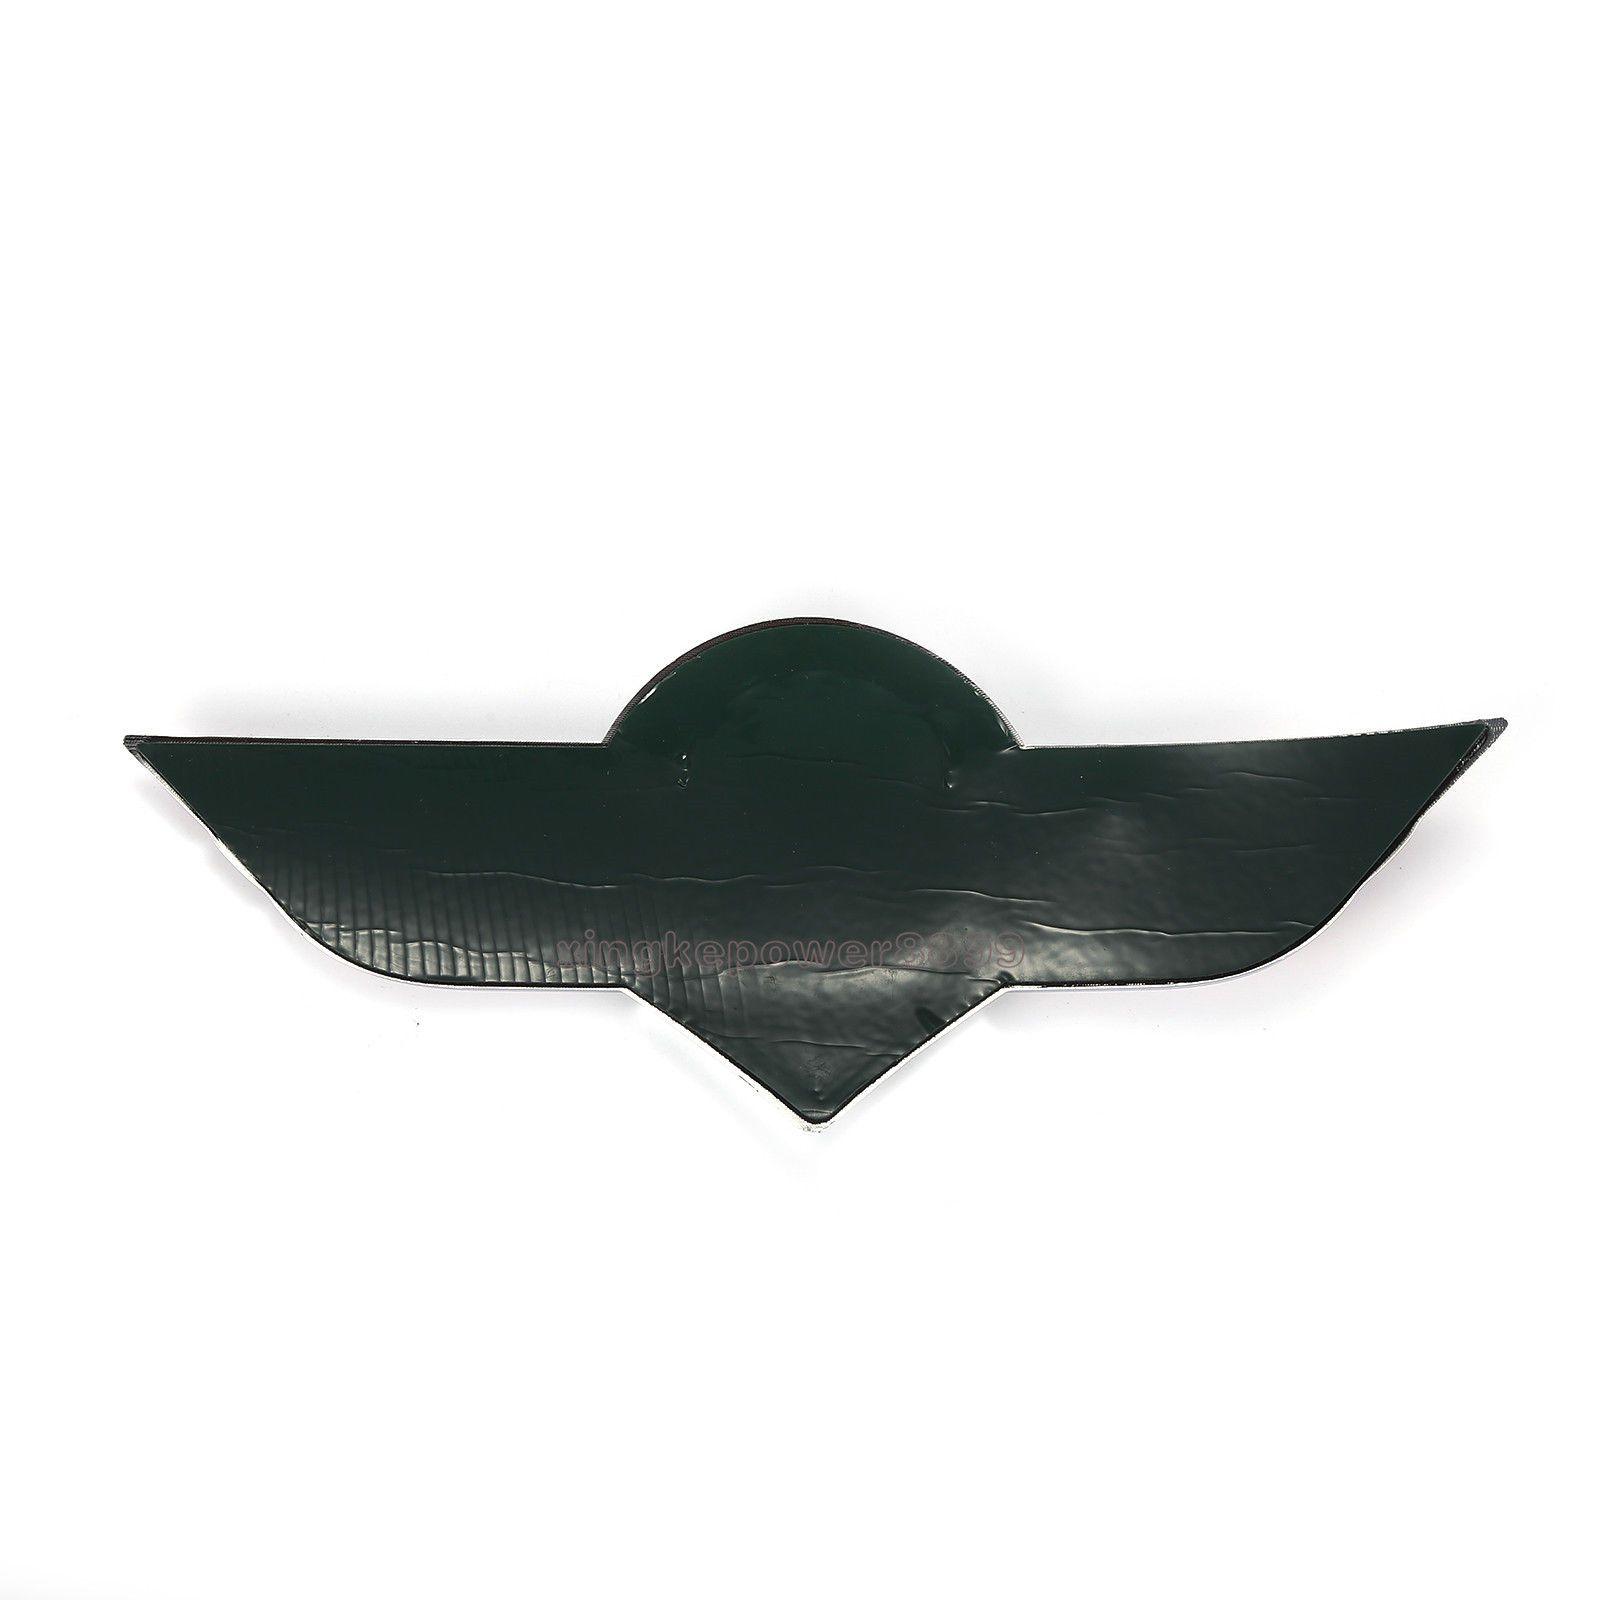 Motorcycle Petrol Tank Left / Right Badge Emblem Decal Stickers For Kawasaki Vulcan Classic